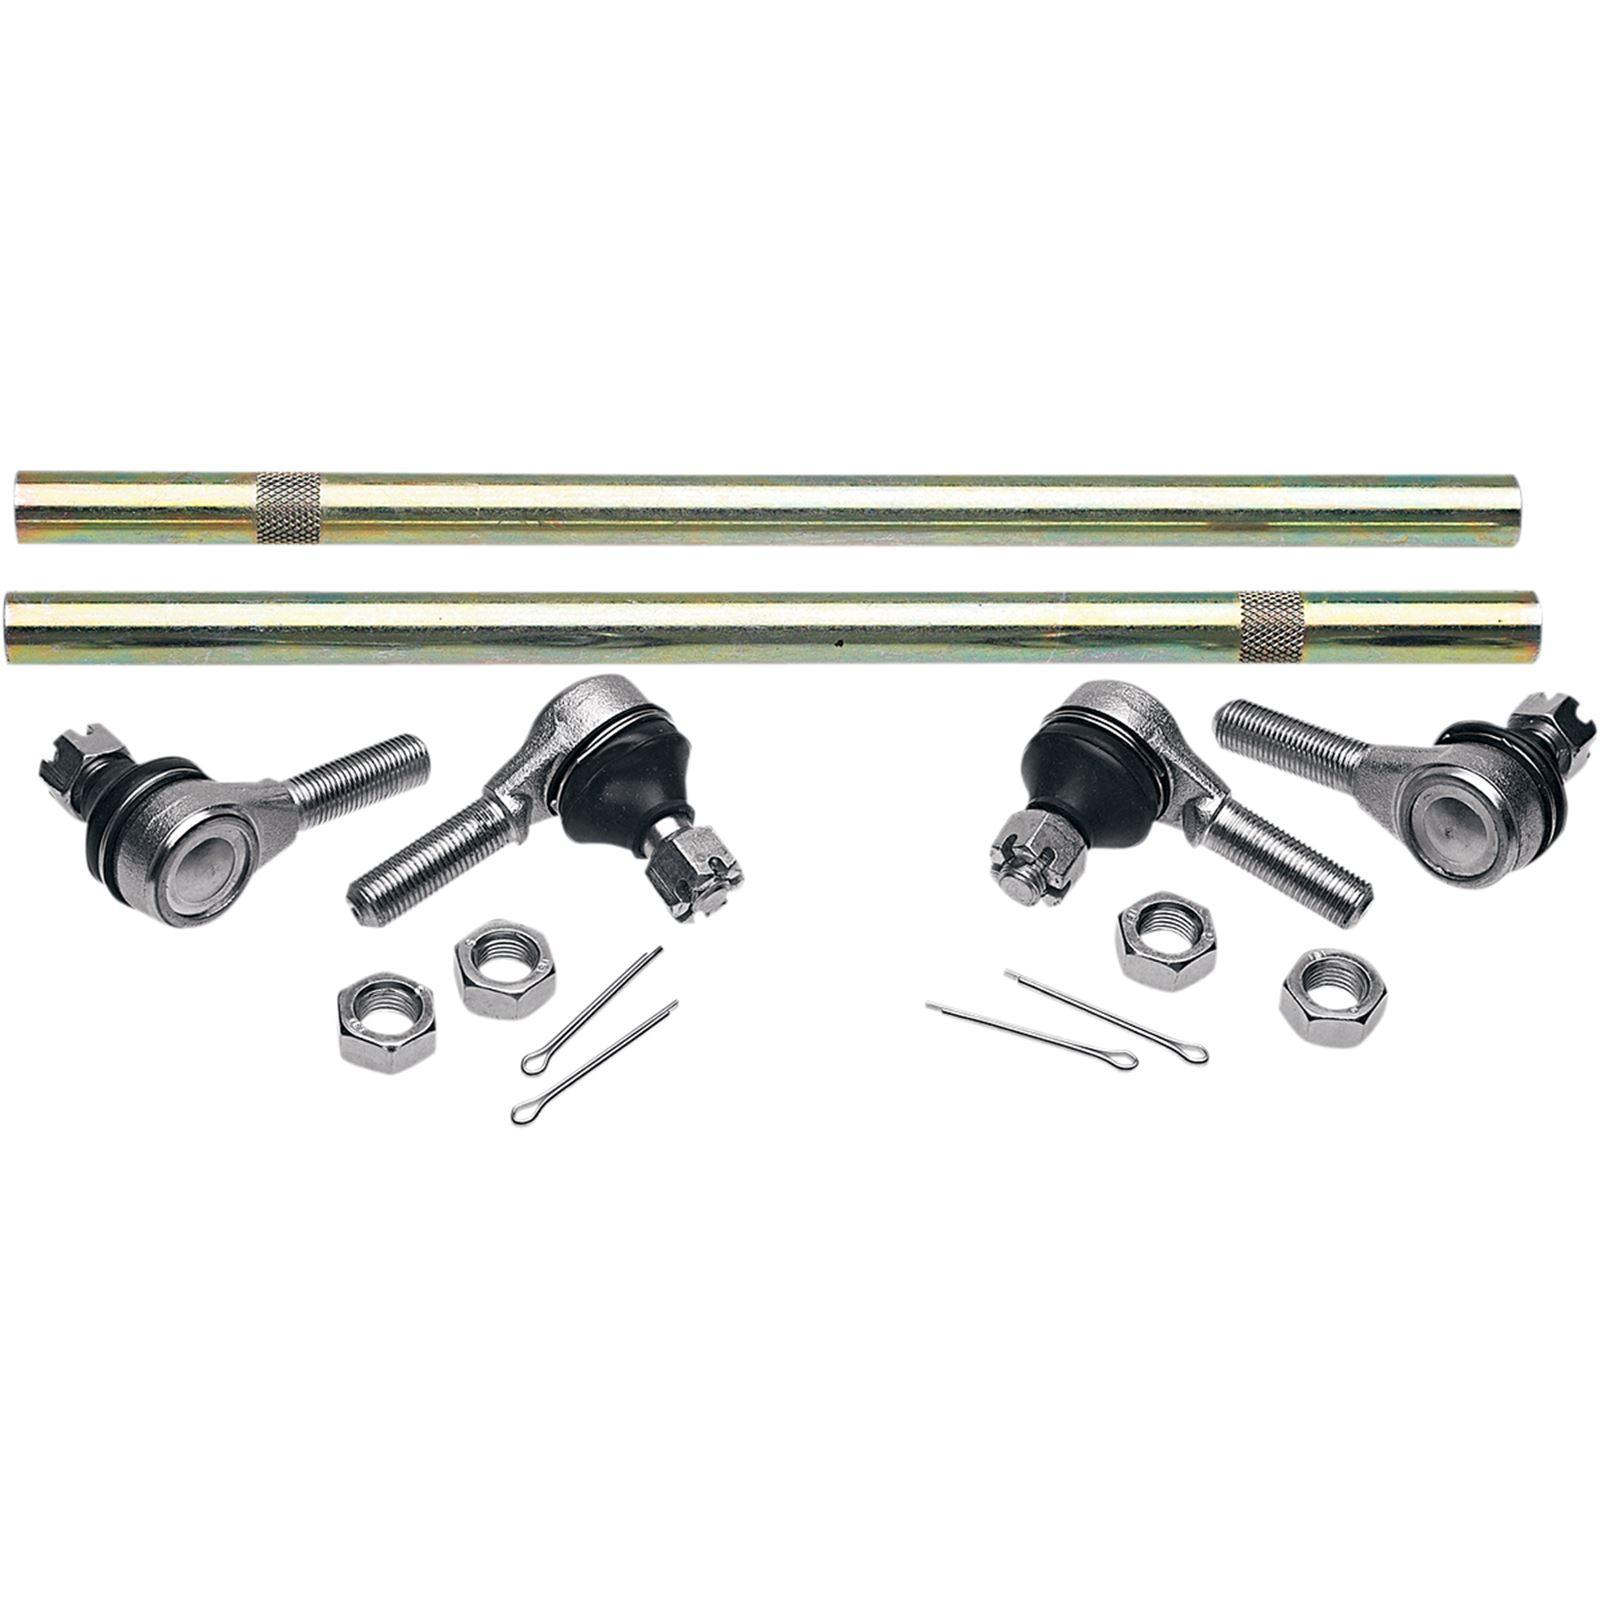 Moose Racing Tie-Rod Upgrade Kit